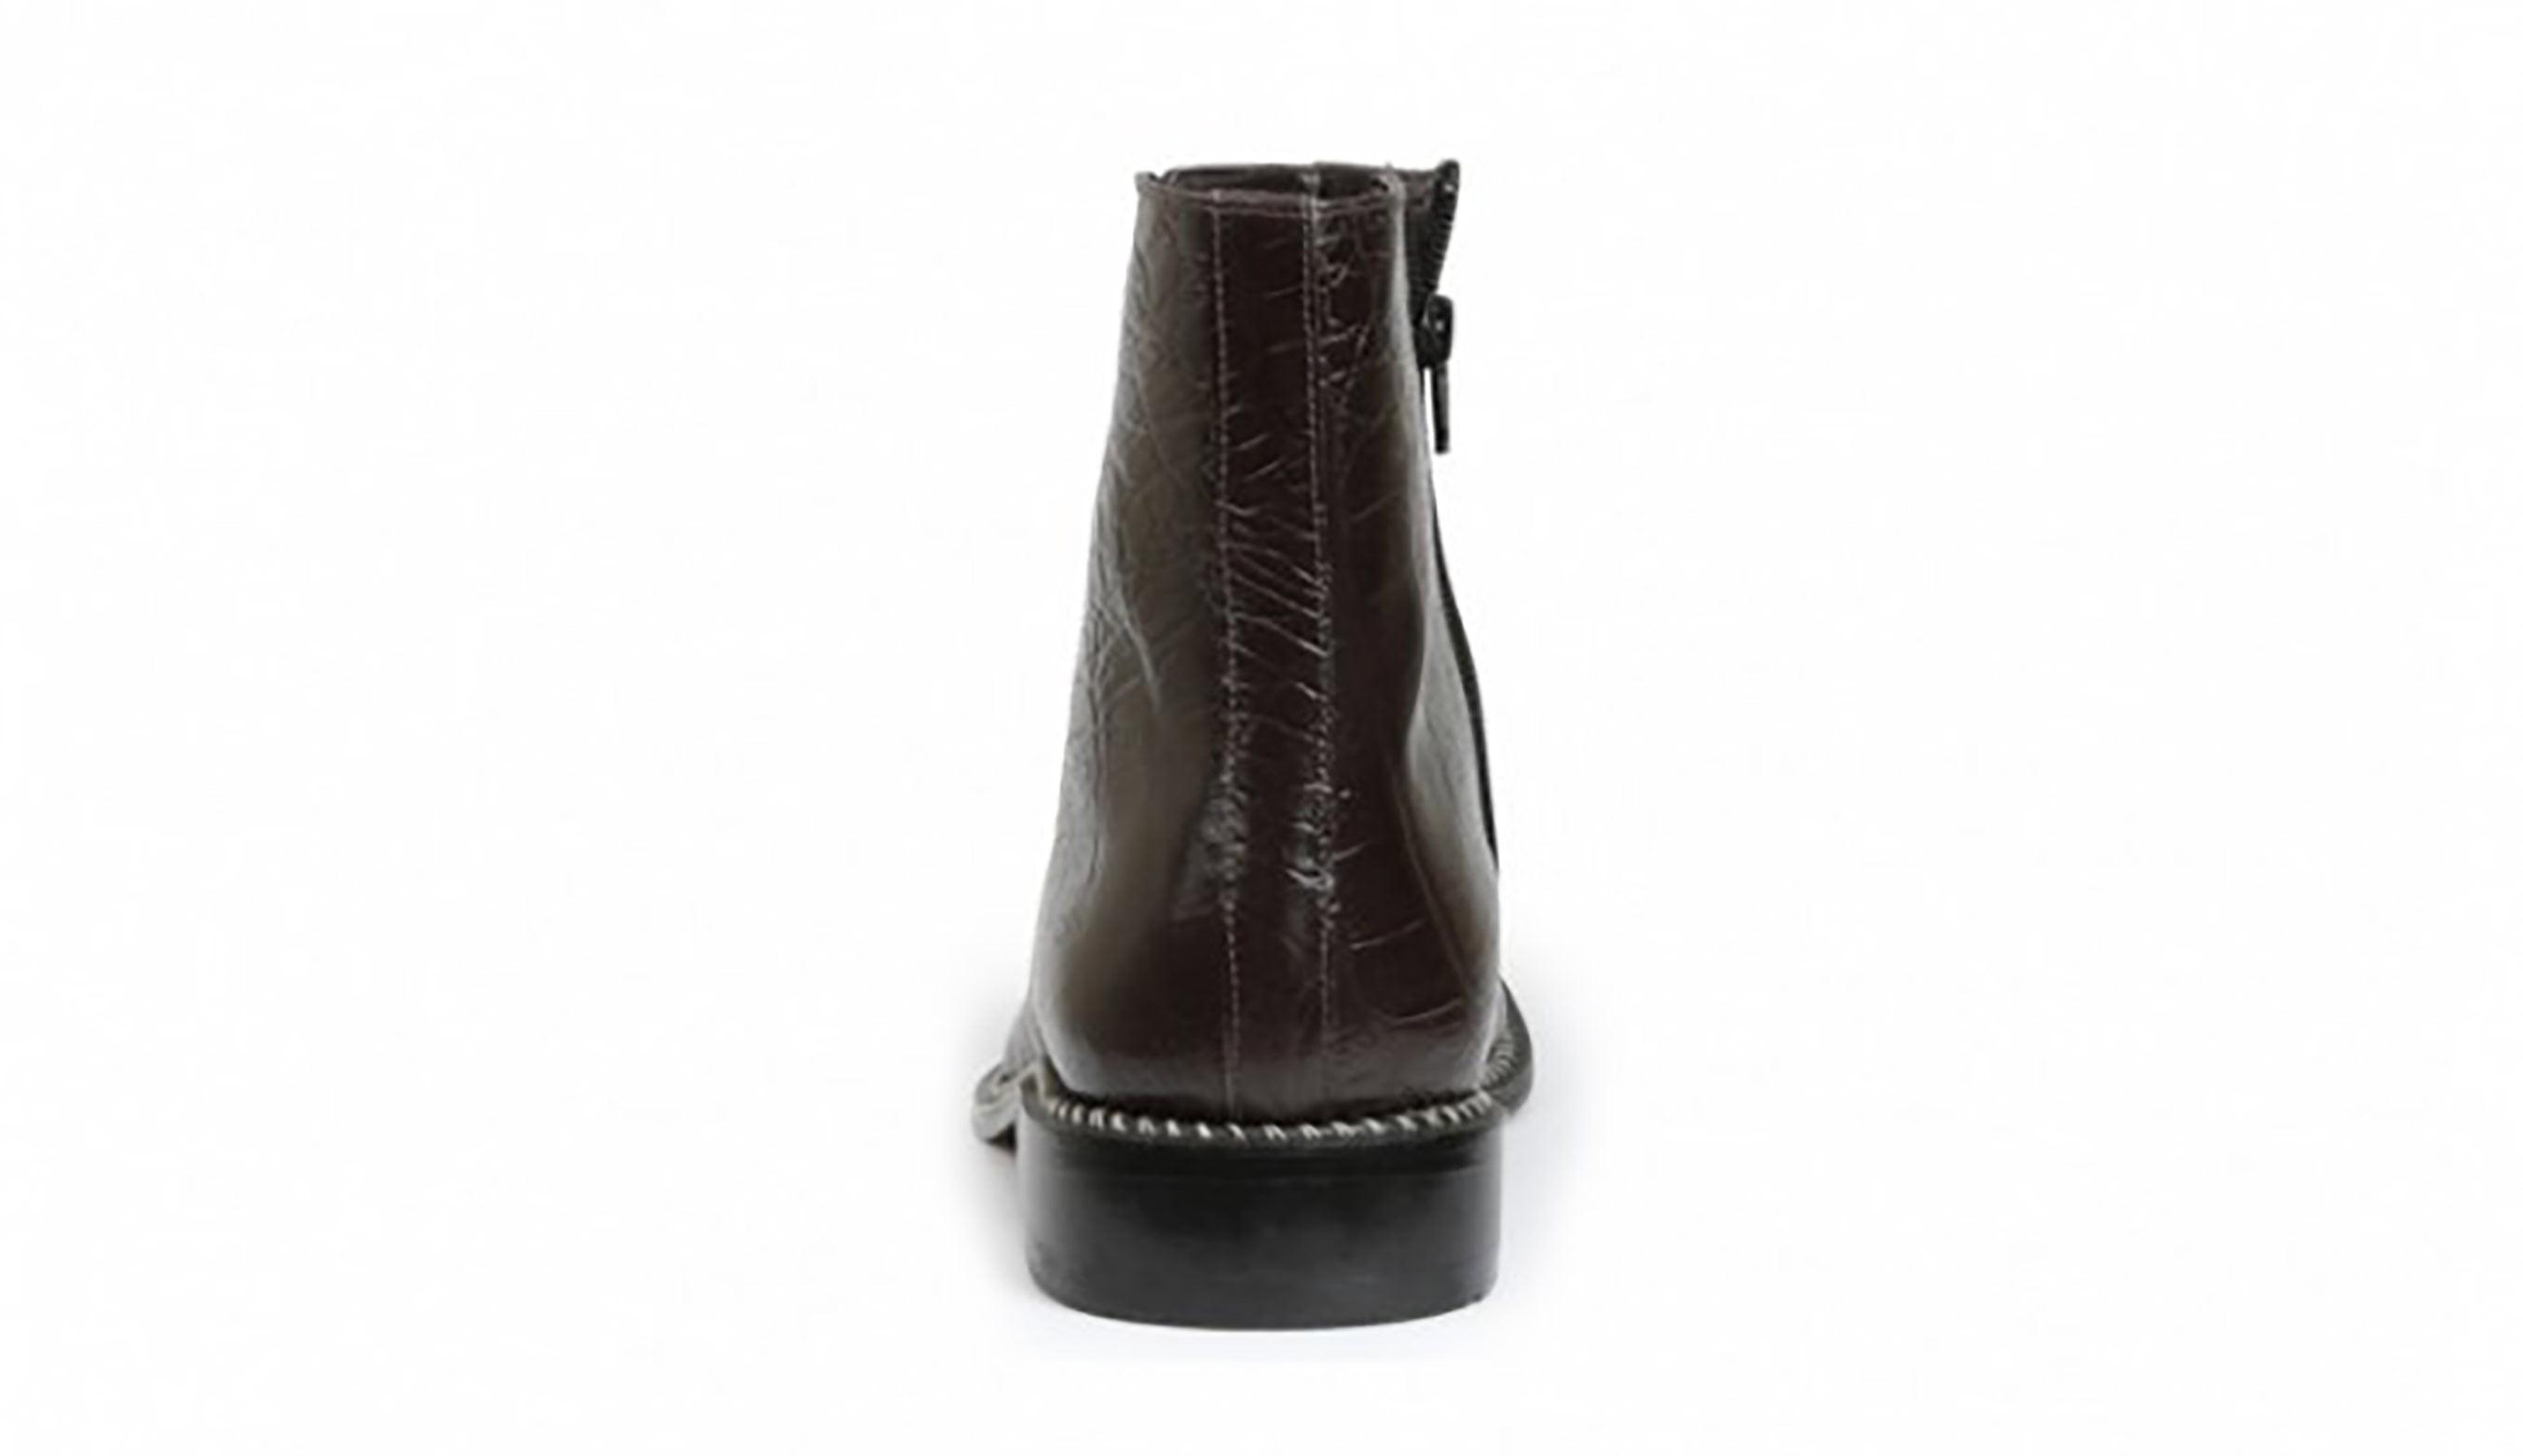 918ddbe88ed Giorgio Brutini CANTO Mens Black Leather Hornback Print Dress Ankle Boots  (7.5 US)